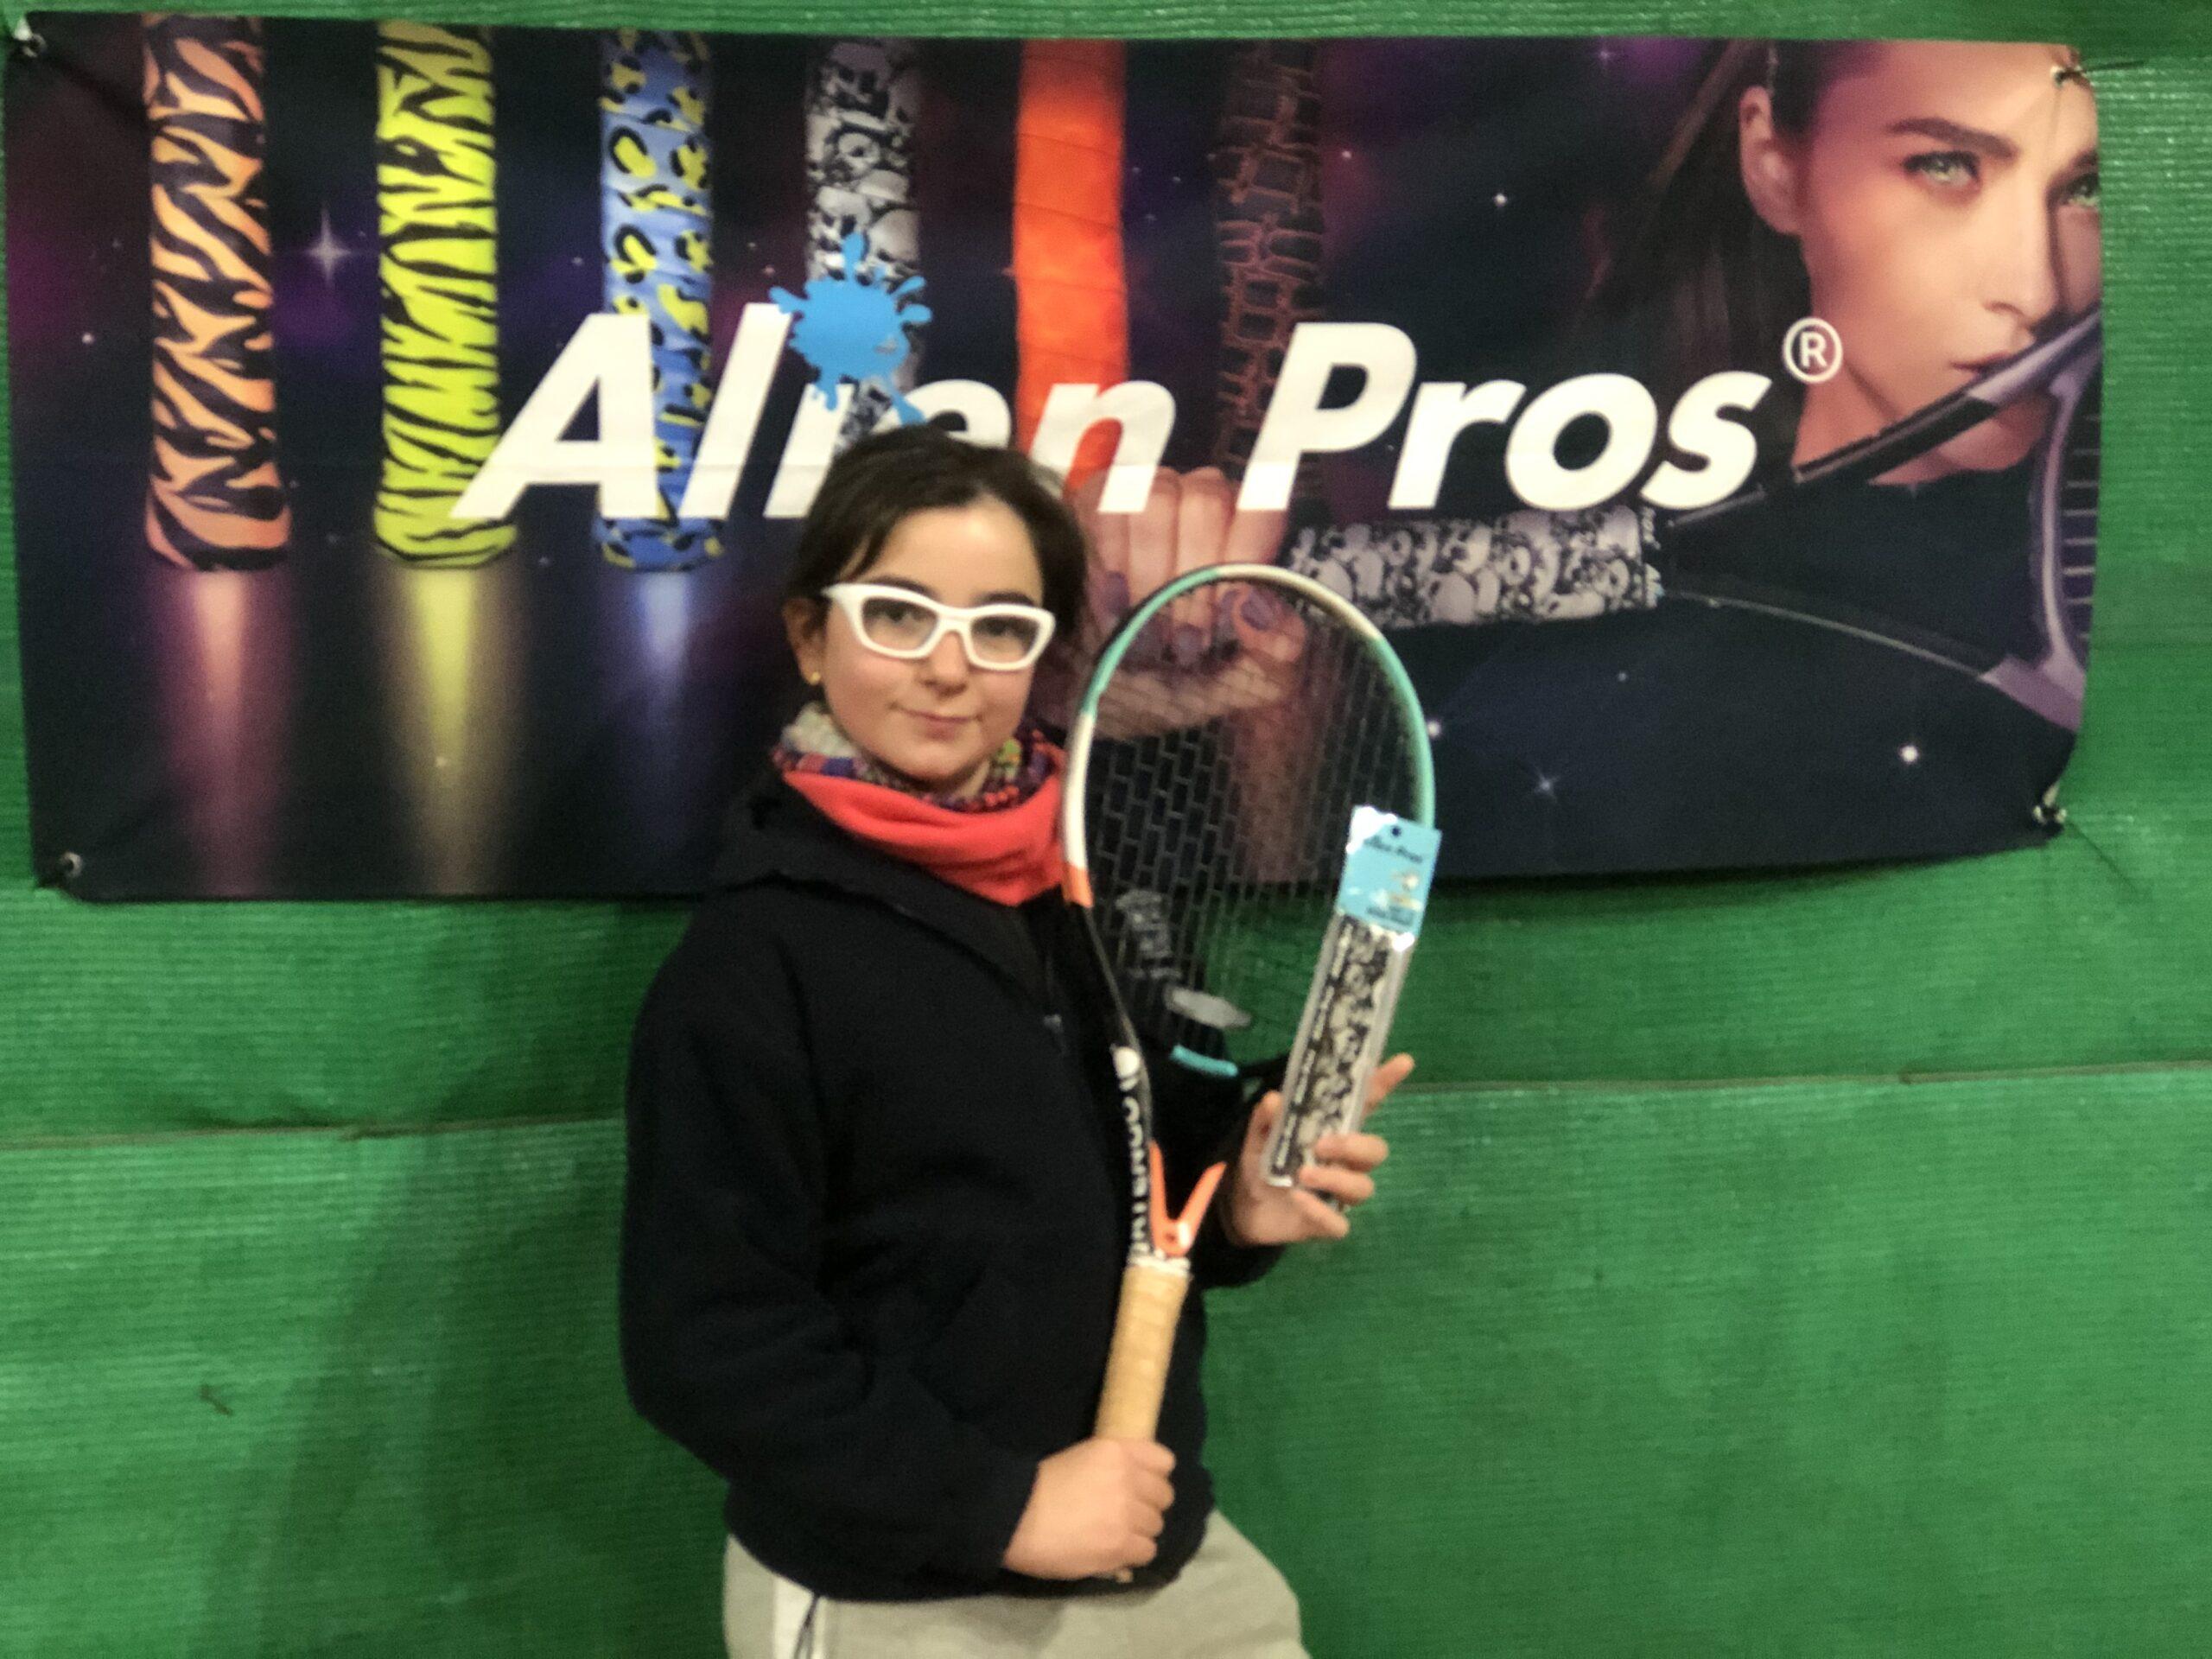 MBA-Tennis-Academy-Alien Pros Alumnos (7)